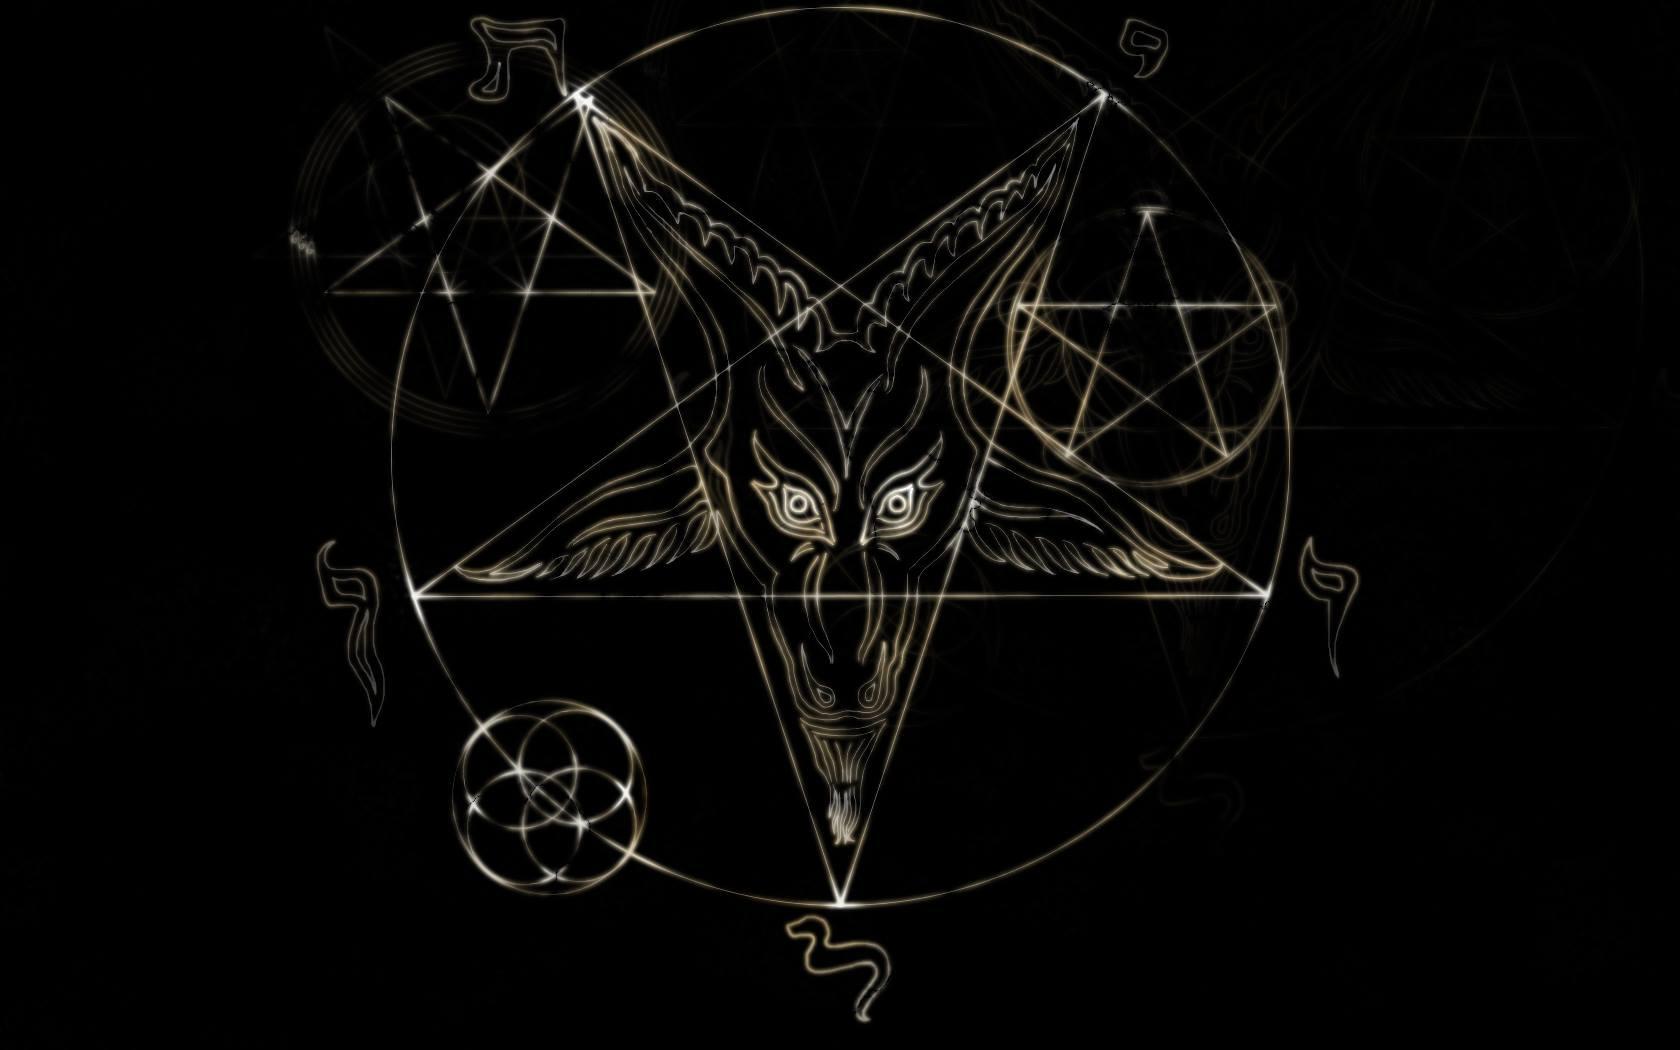 Lucifer Wallpaper 4k: Satanic Pentagram Wallpapers